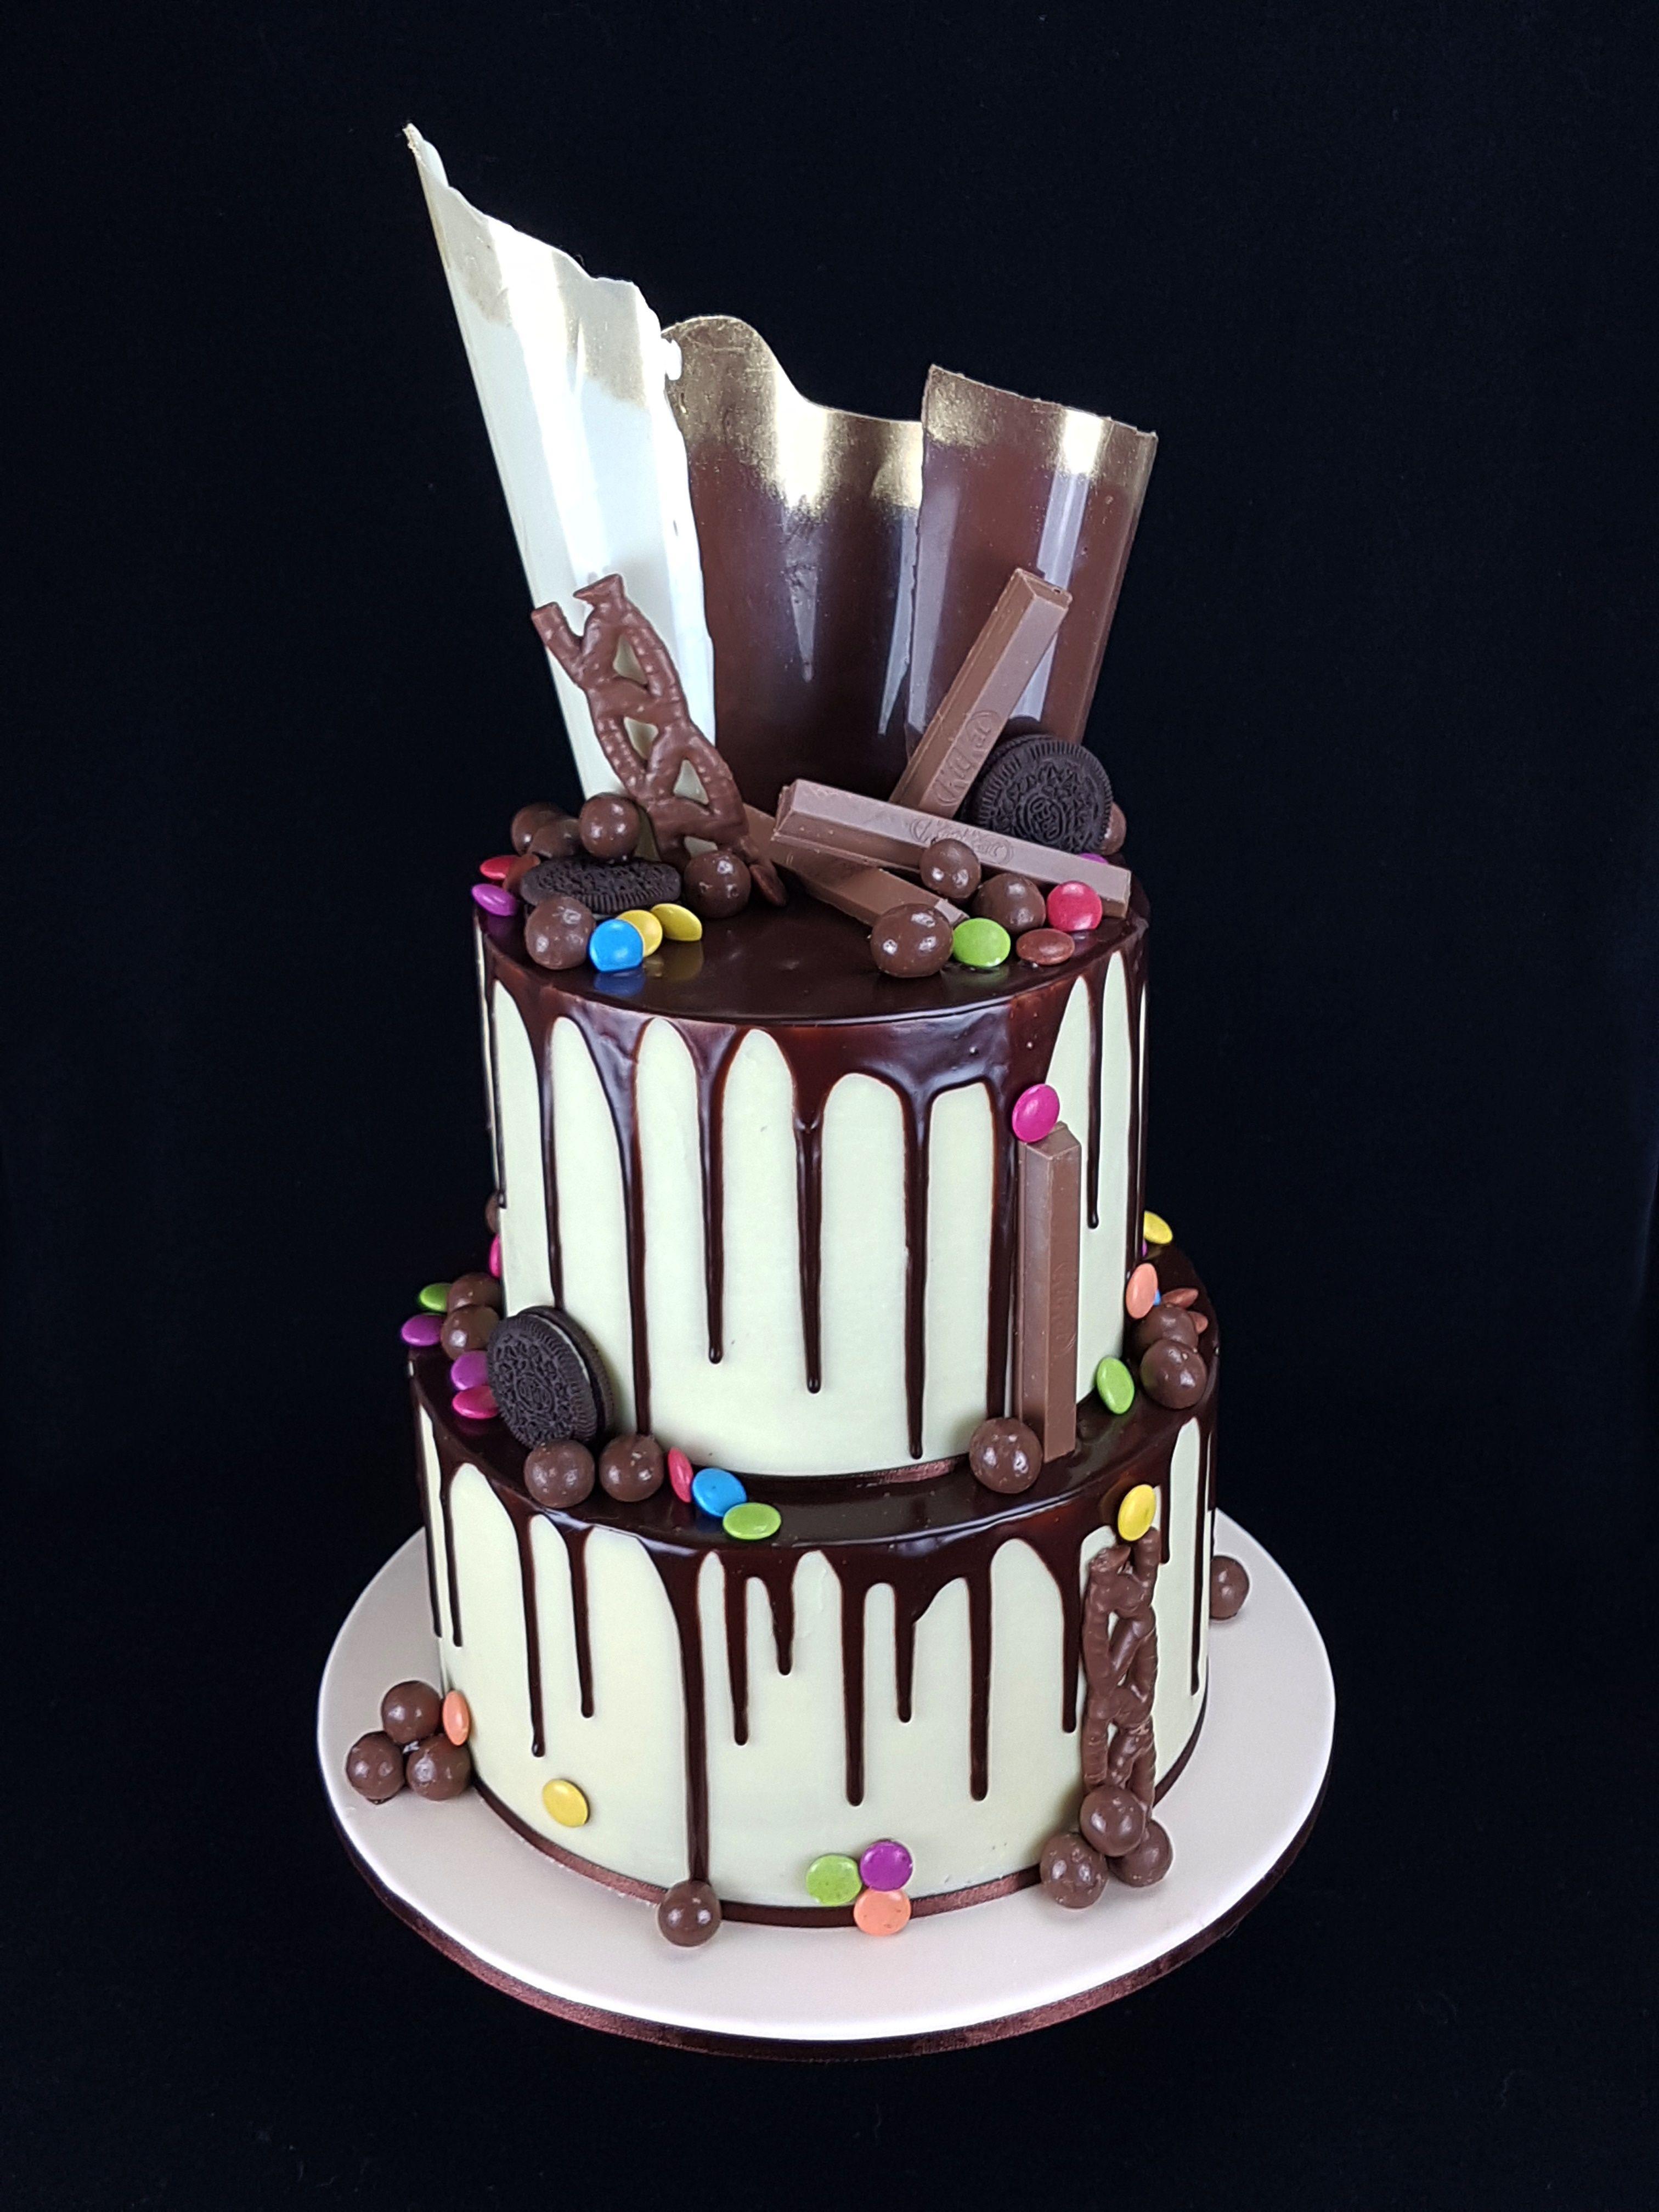 Drip Cake A Combination Of Milk Chocolate Mud Cake With